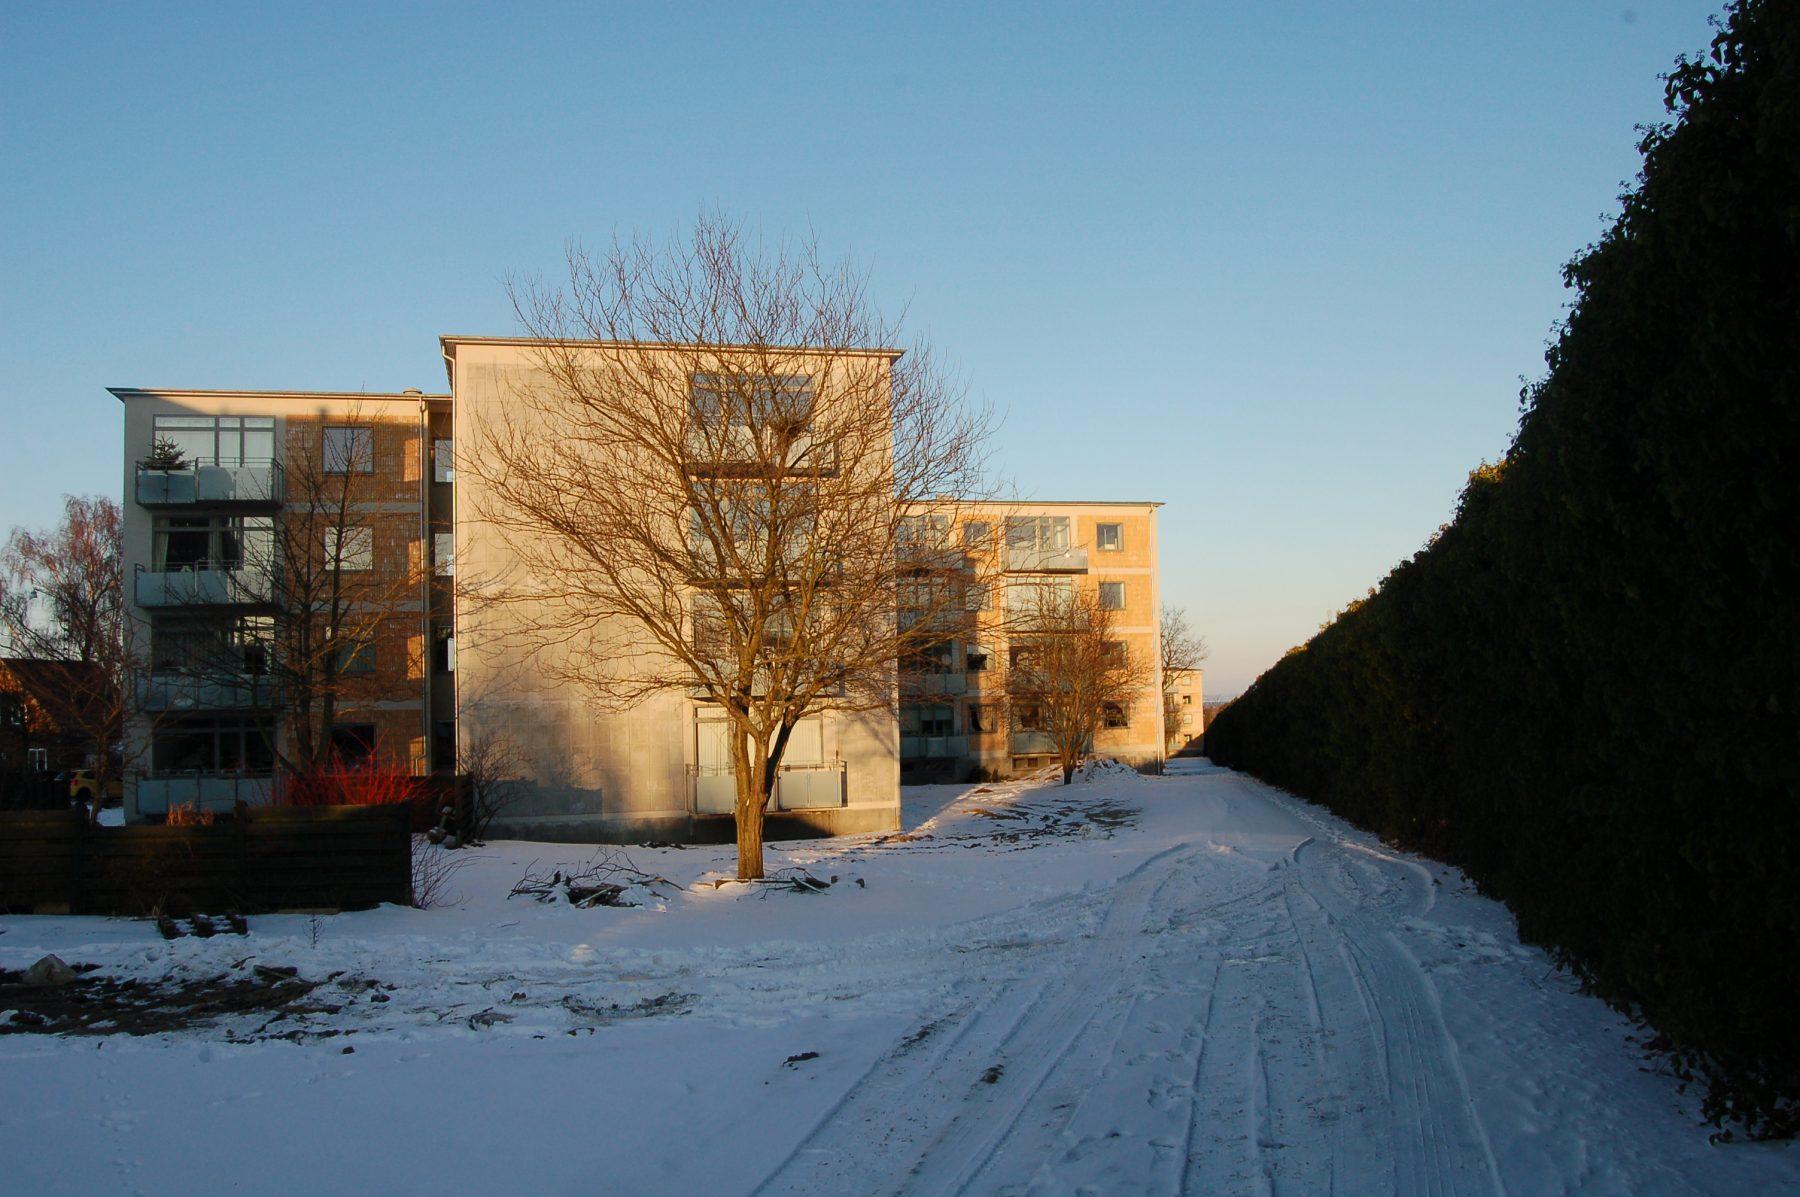 AAB, afd. 19, Vorrevangsparken, Aarhus - blokke